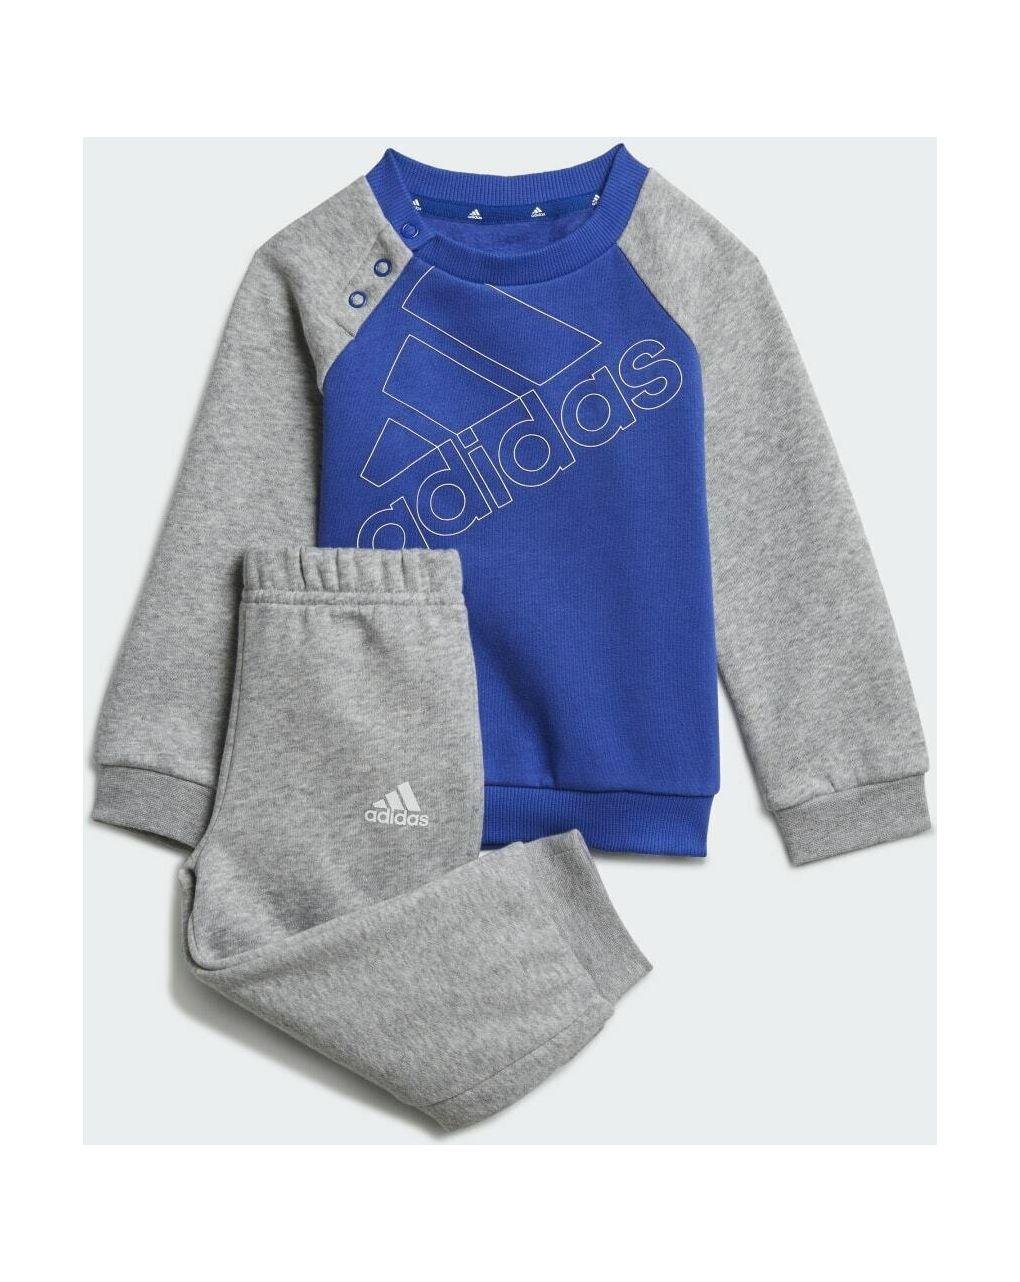 Adidas Σετ Φόρμας Essentials Μπλε/Γκρι για Αγόρι GS4266